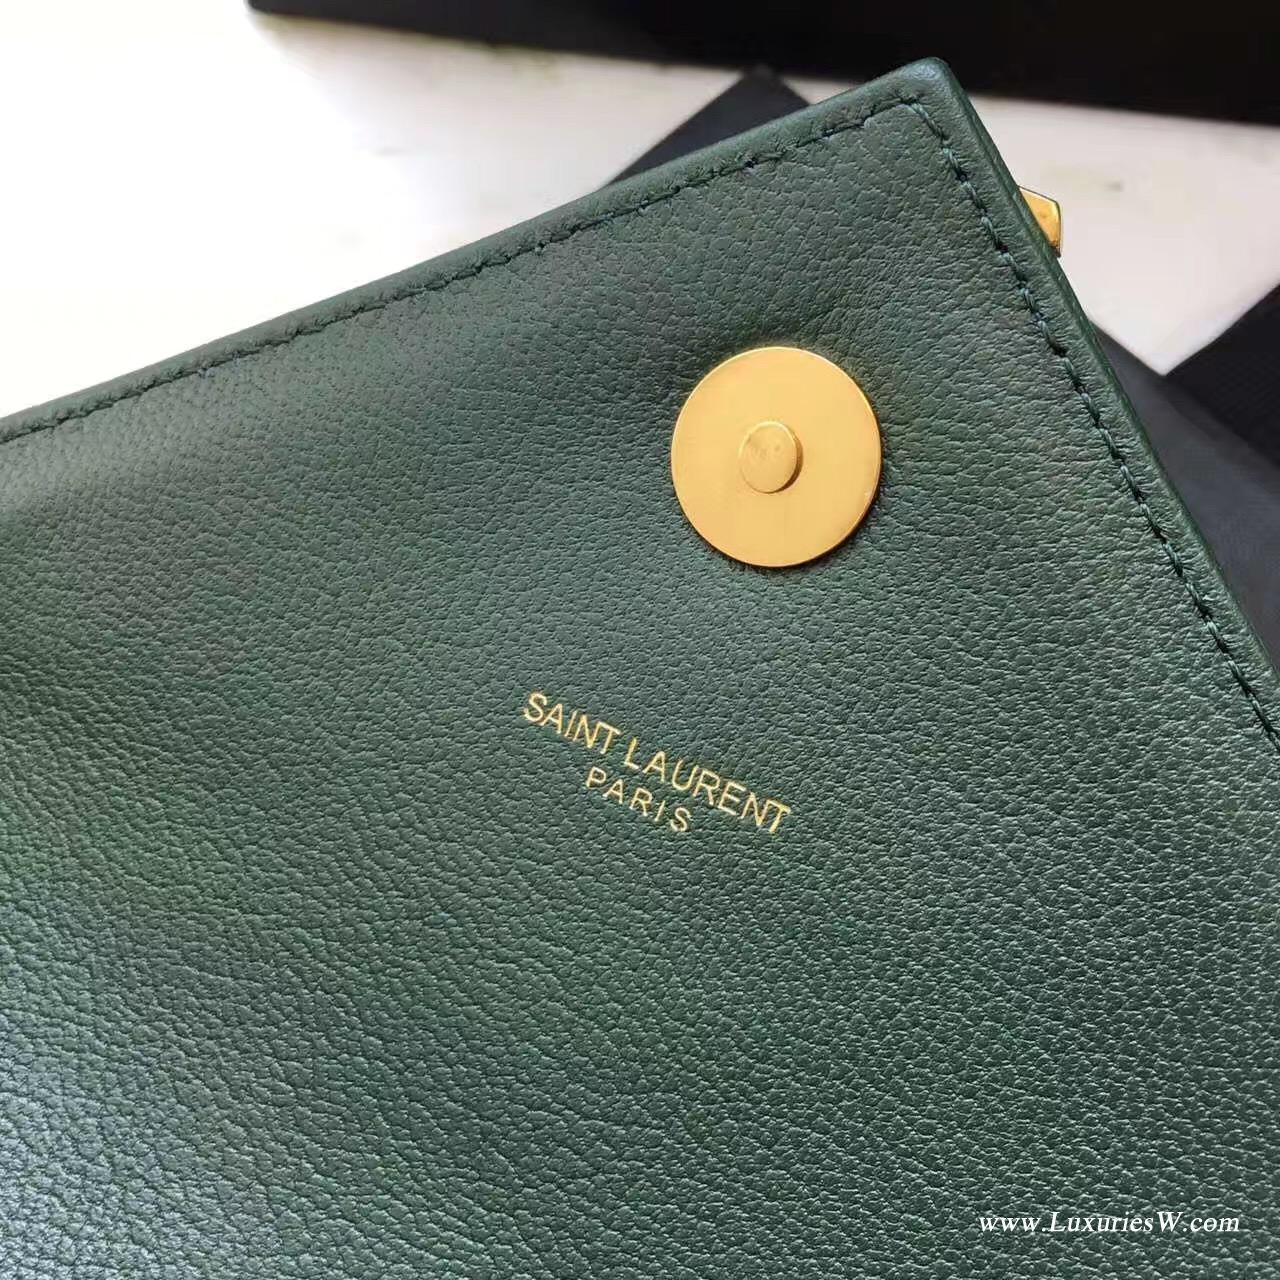 聖羅蘭YSL 經典中號MONOGRAM SAINT LAURENT COLLÈGE绿色古金